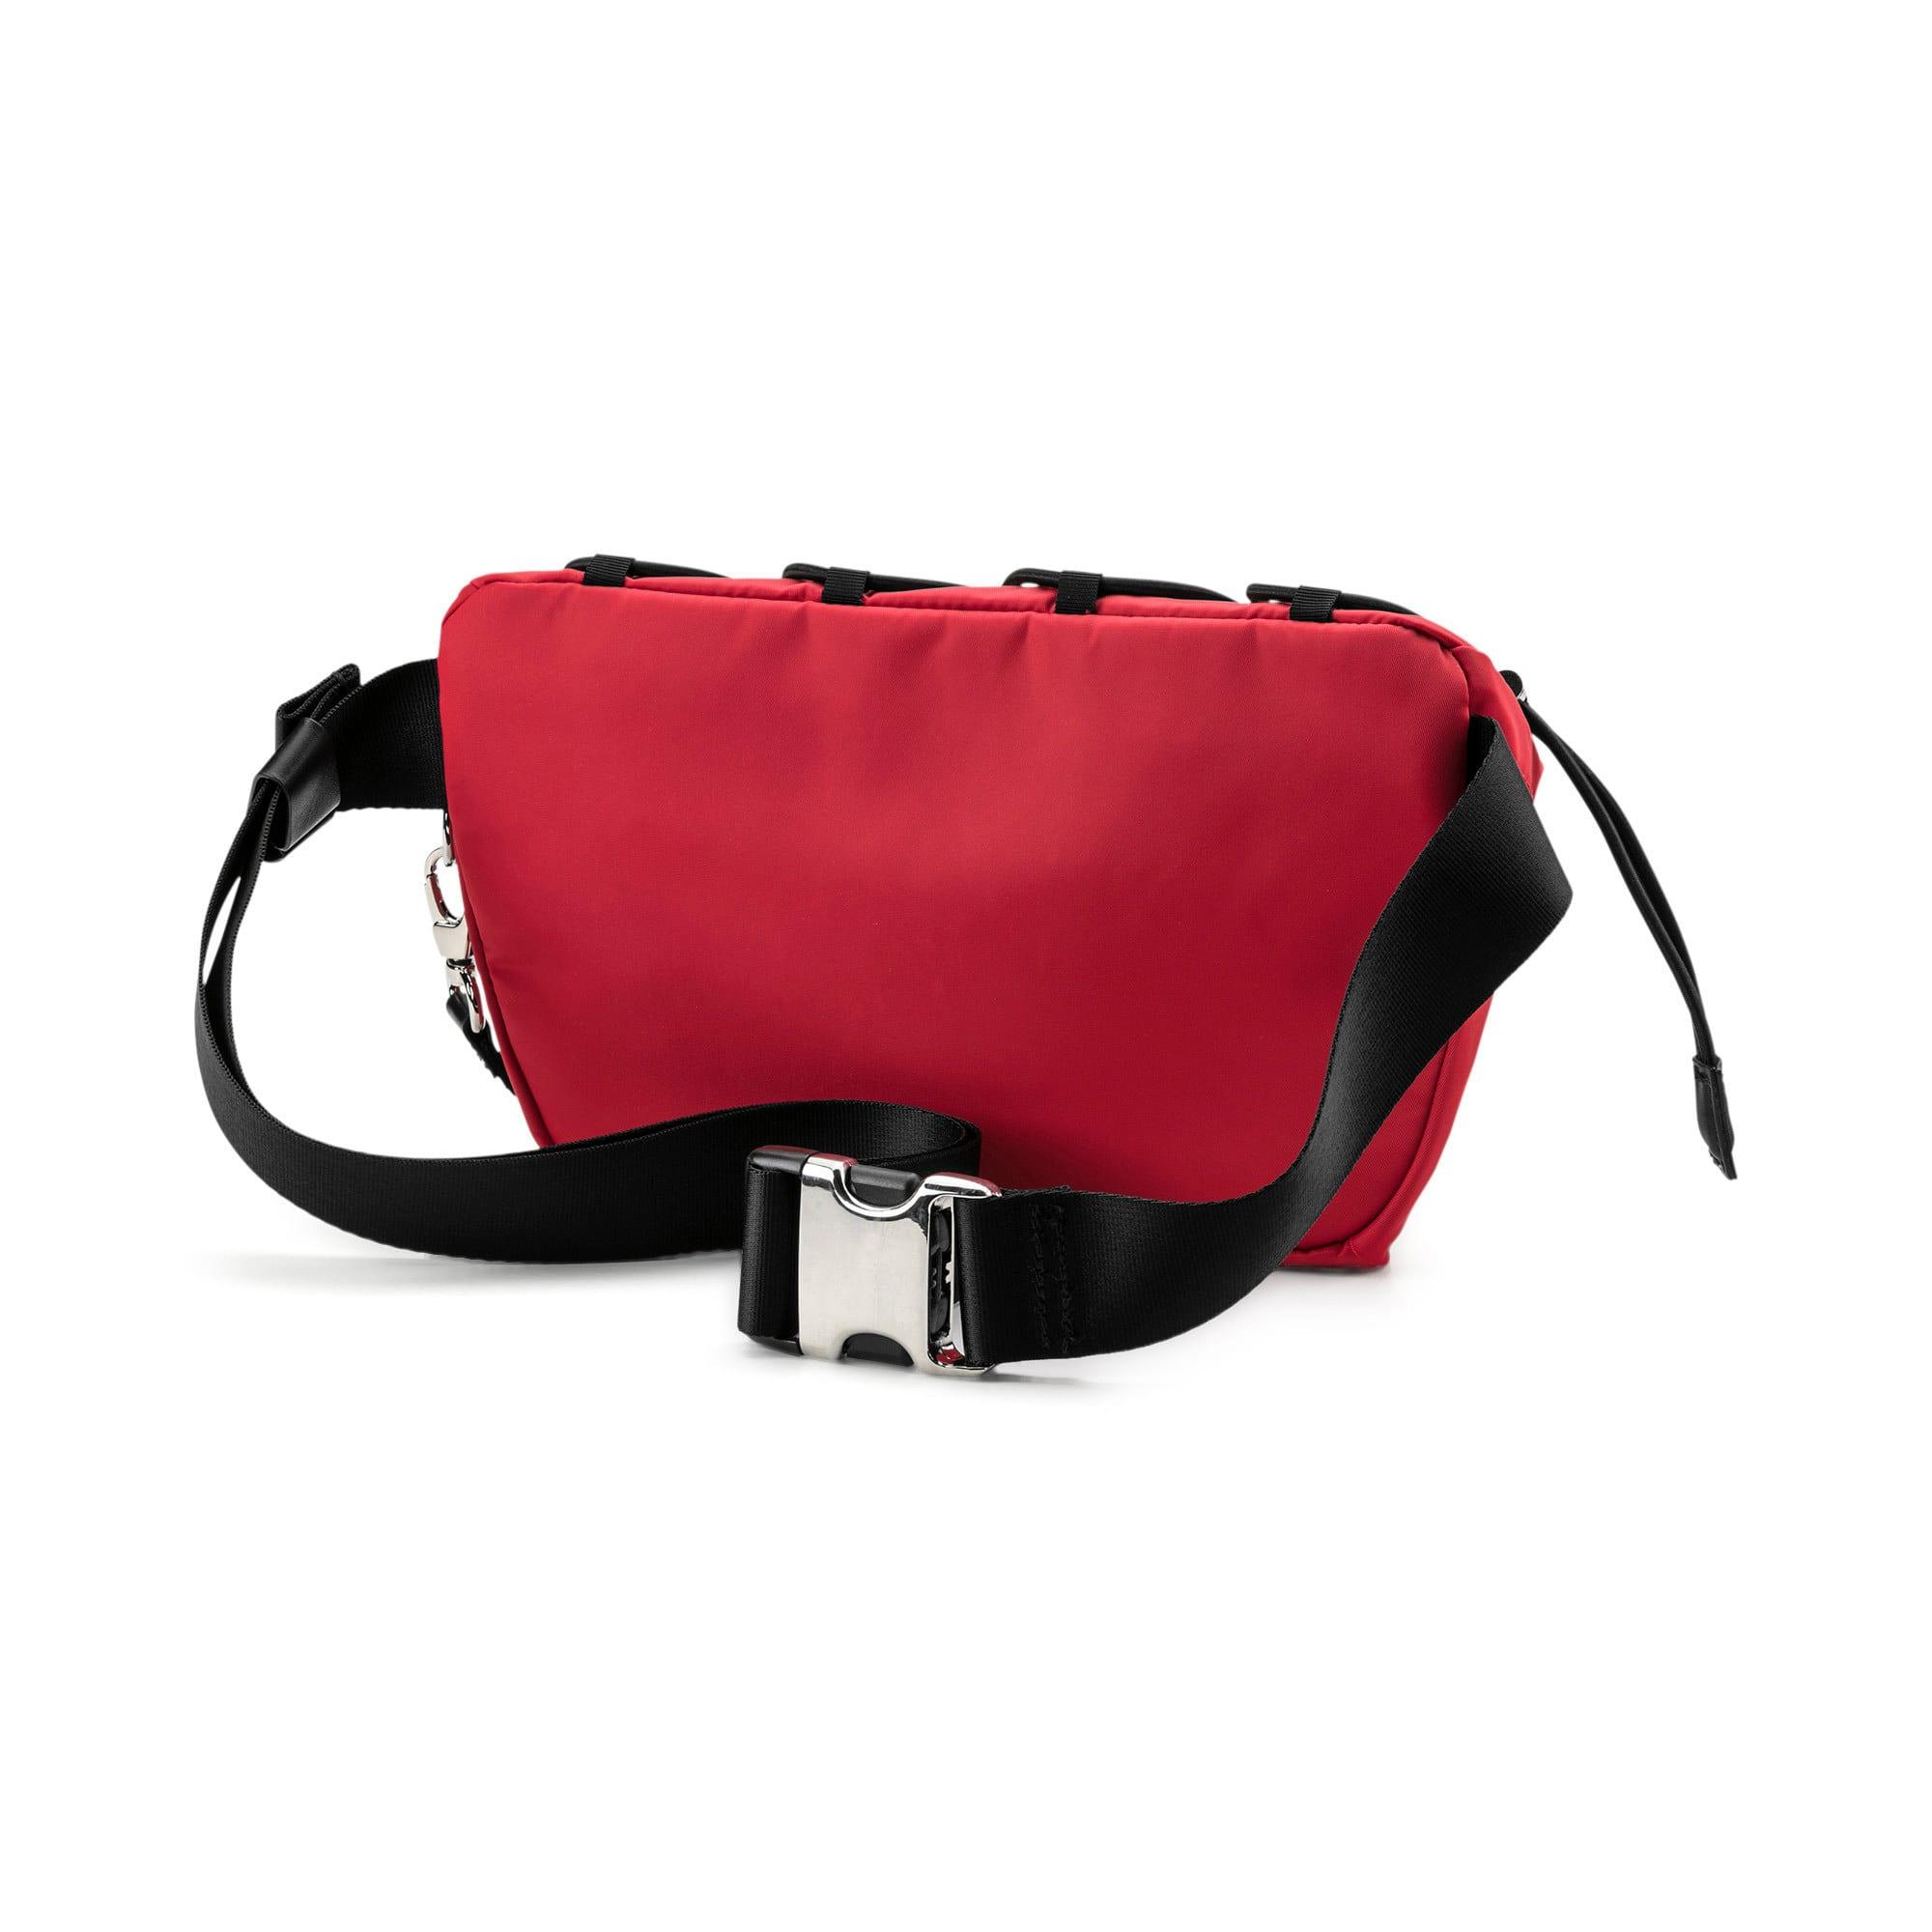 Thumbnail 4 of PUMA x KARL LAGERFELD Waist Bag, High Risk Red-Puma Black, medium